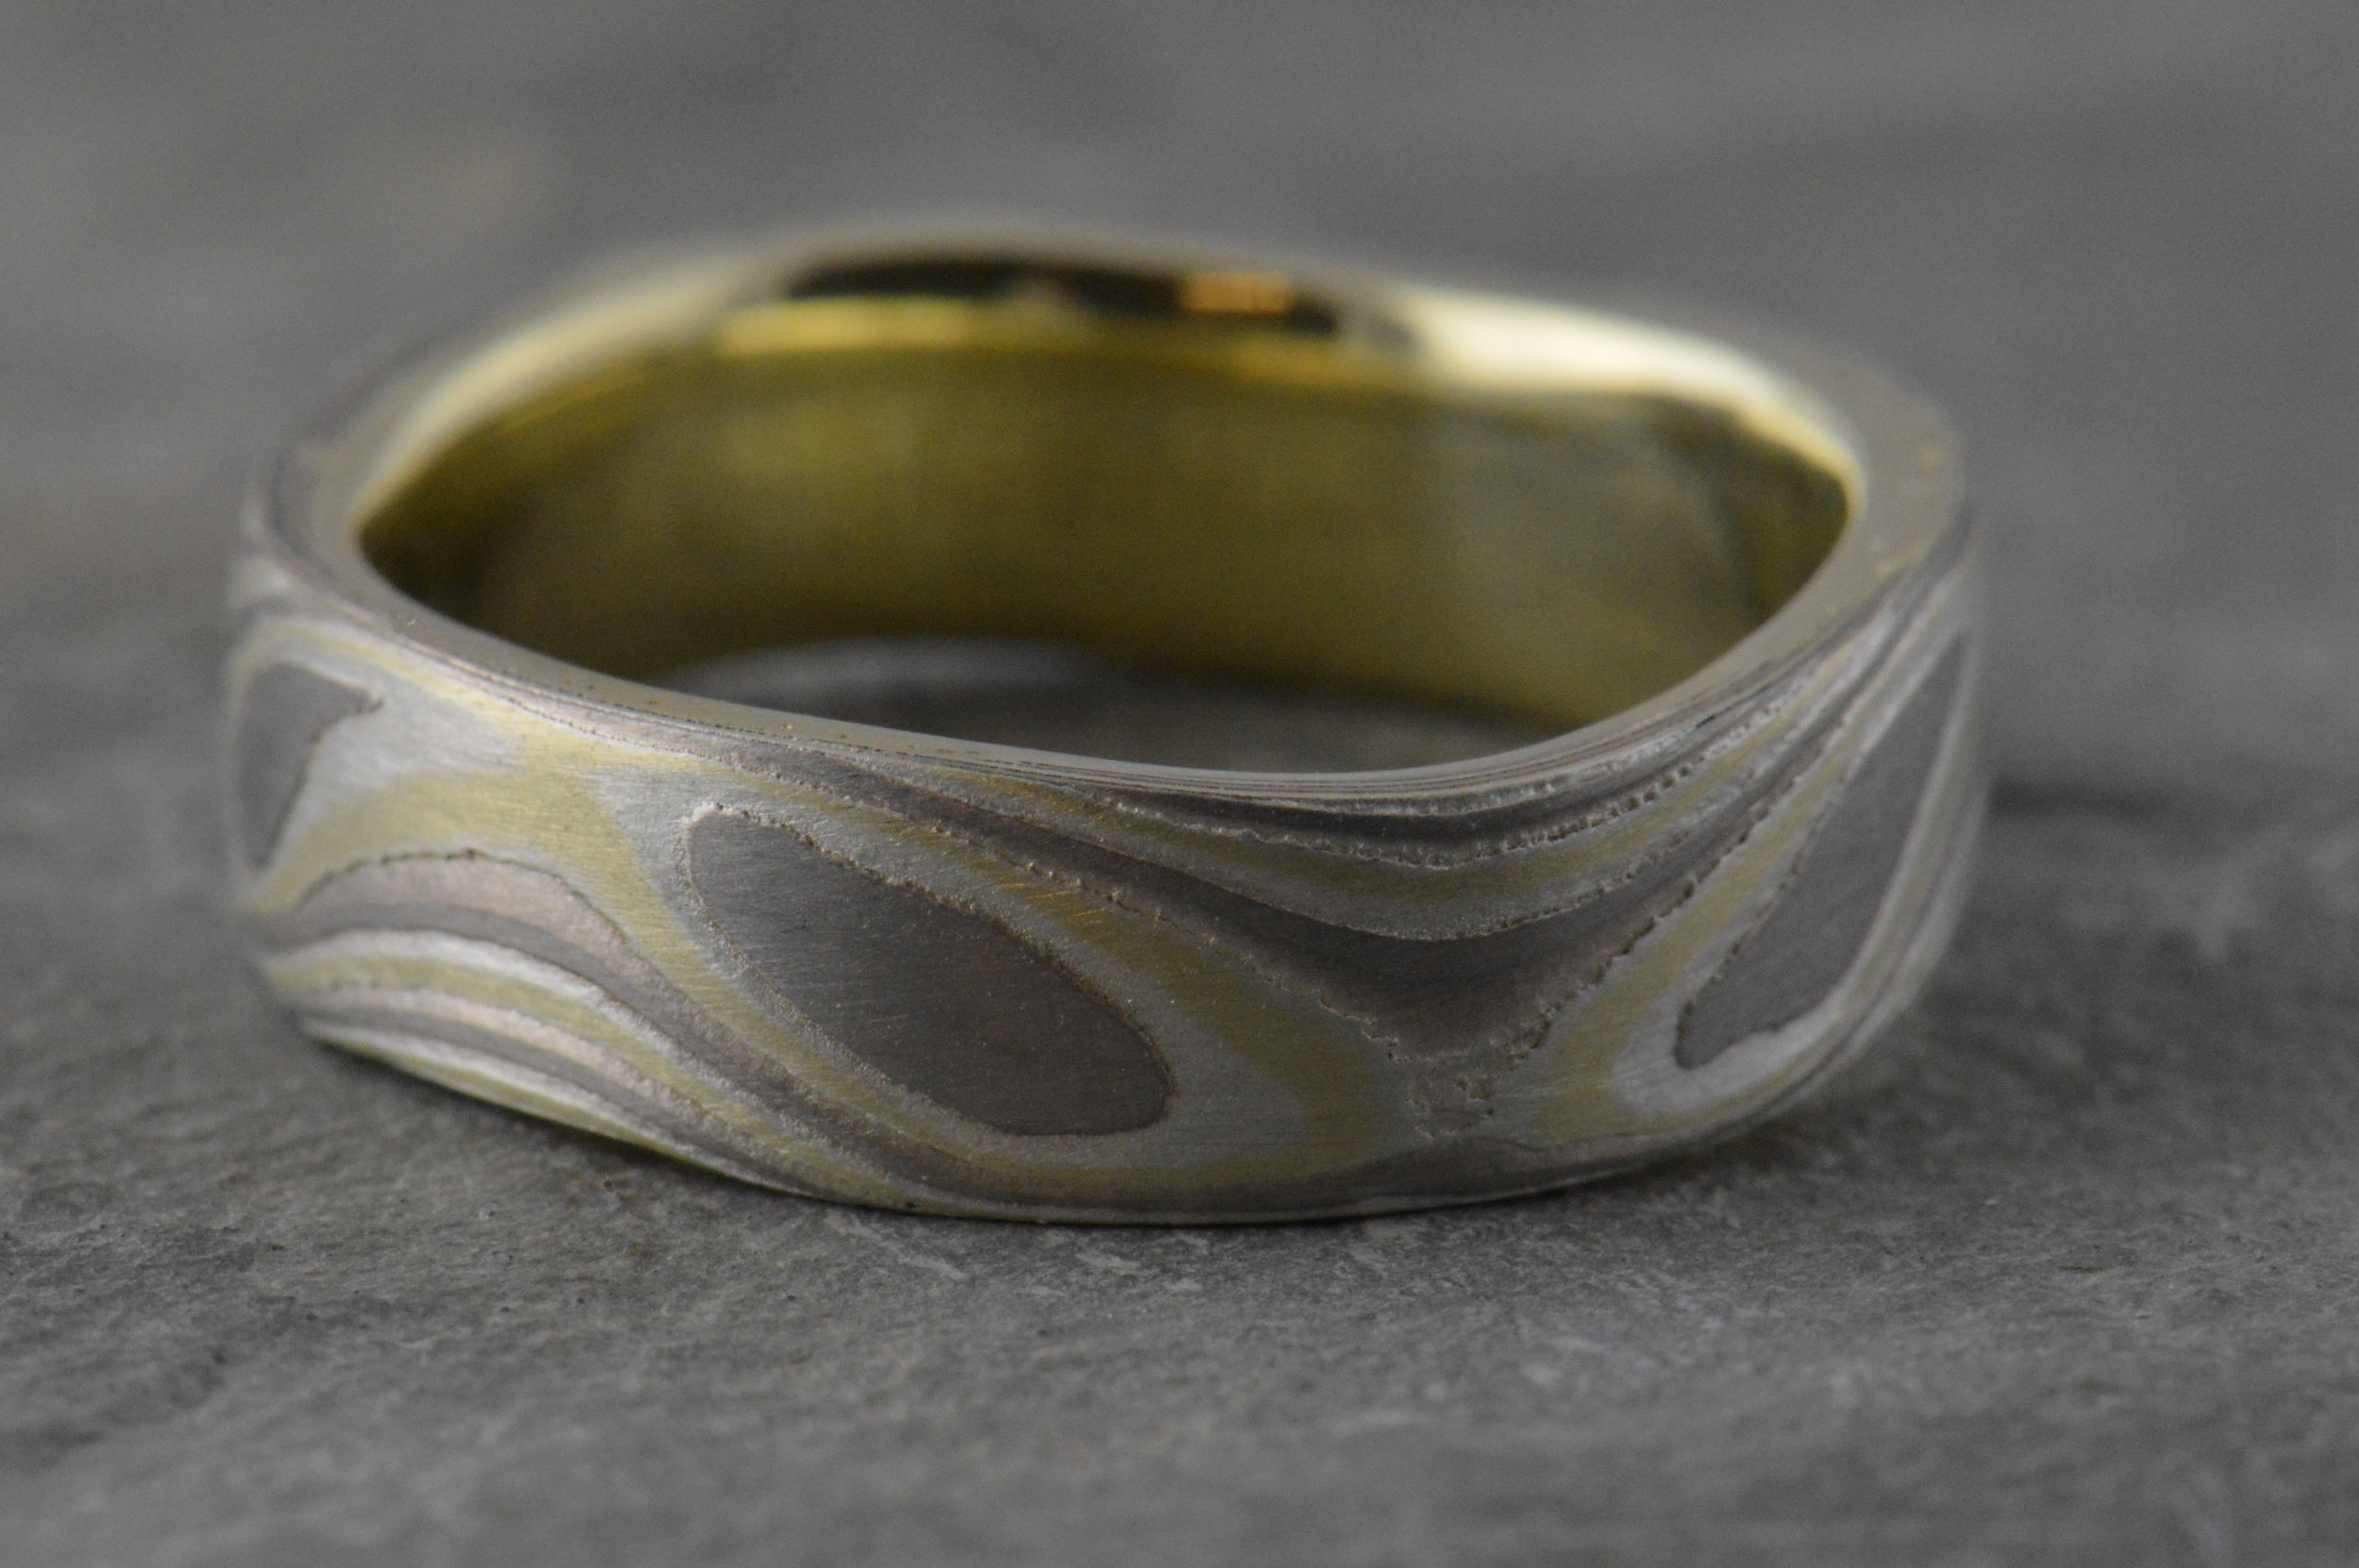 darvier-green-gold-palladium-wavy-wave-pattern-ring.JPG